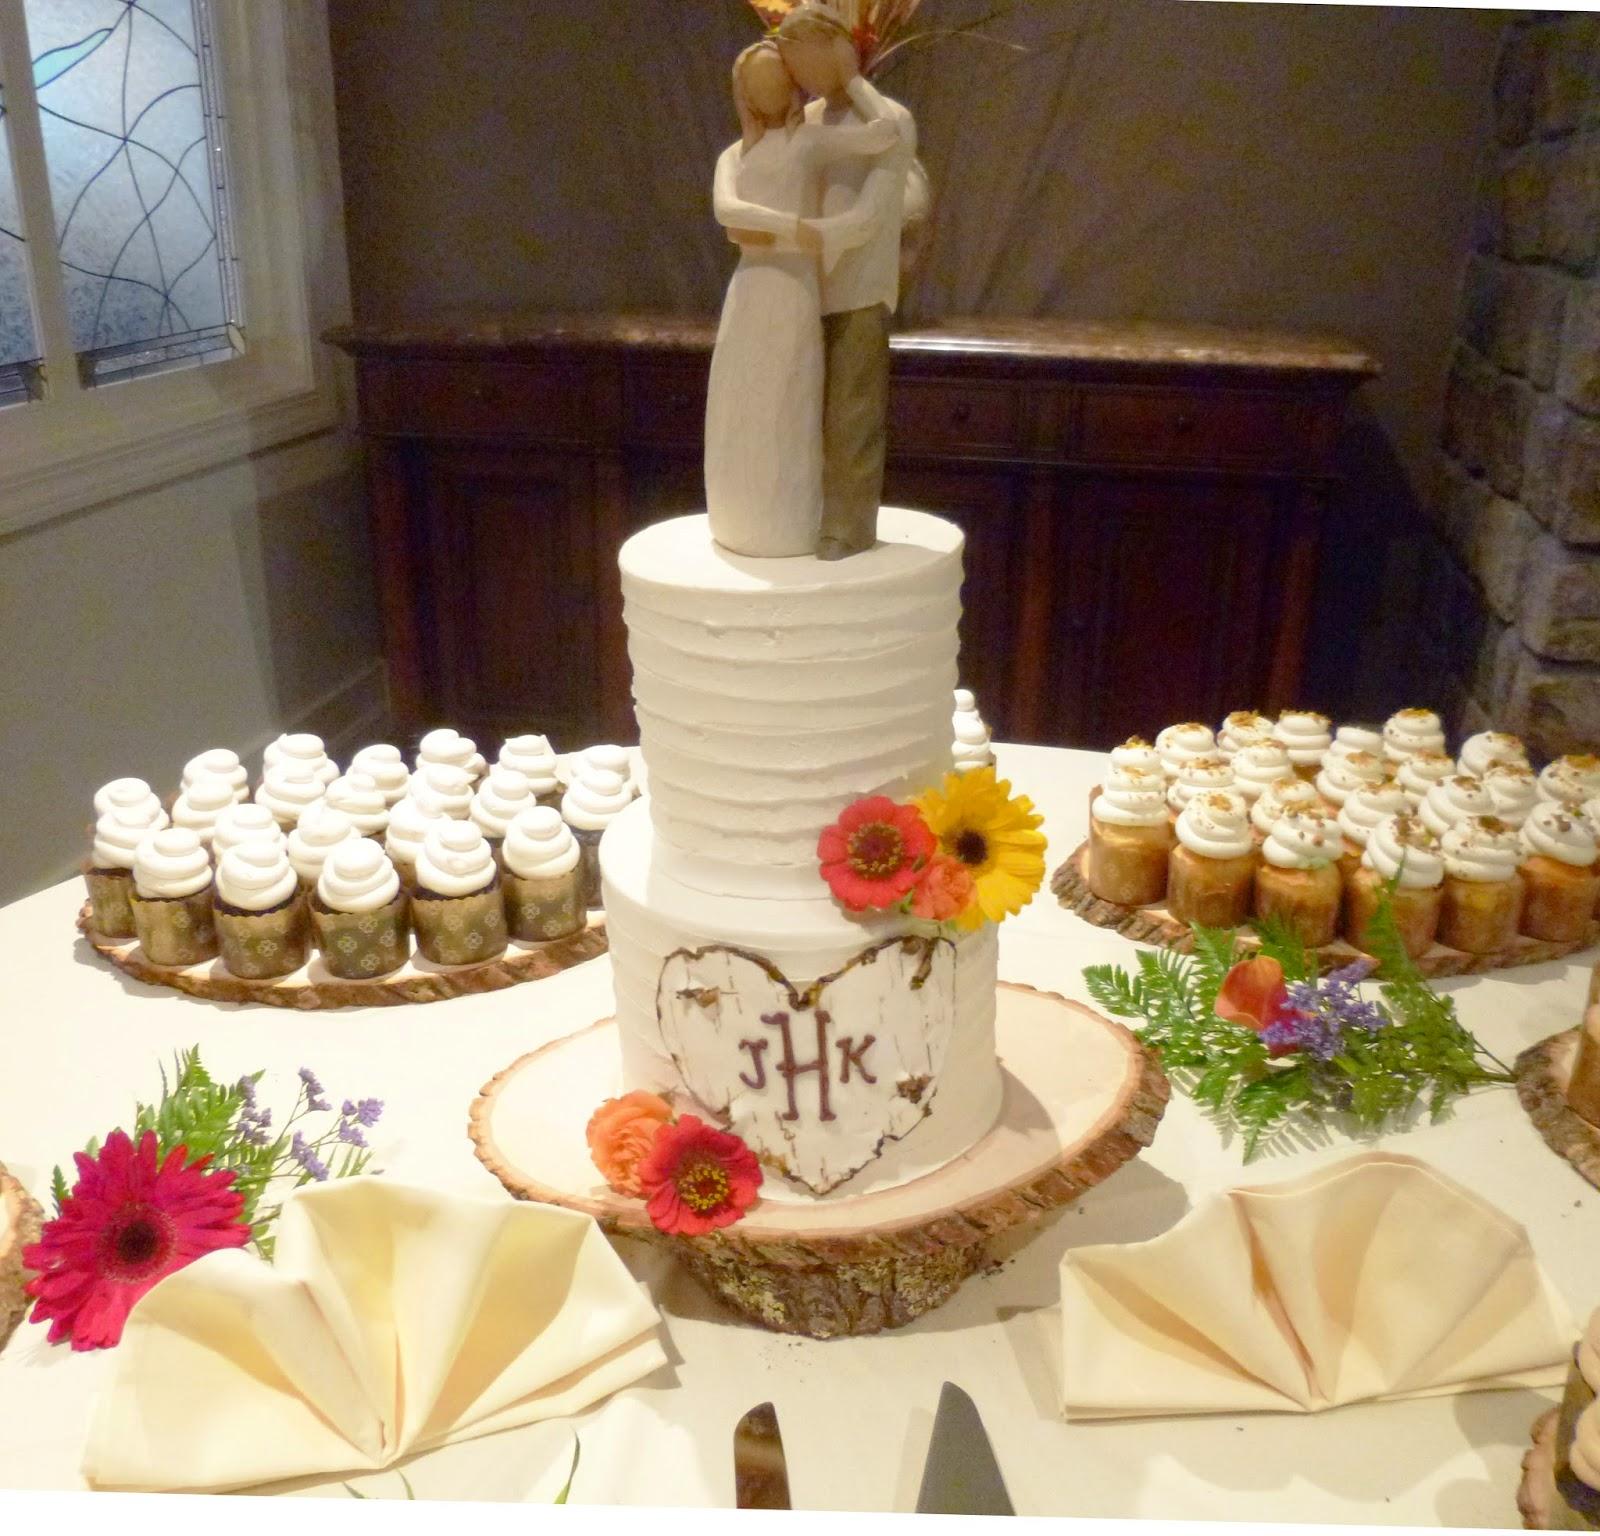 Rustic Wedding Cakes: Artisan Bake Shop: Independence Harbor, Weddings, Assonet, MA